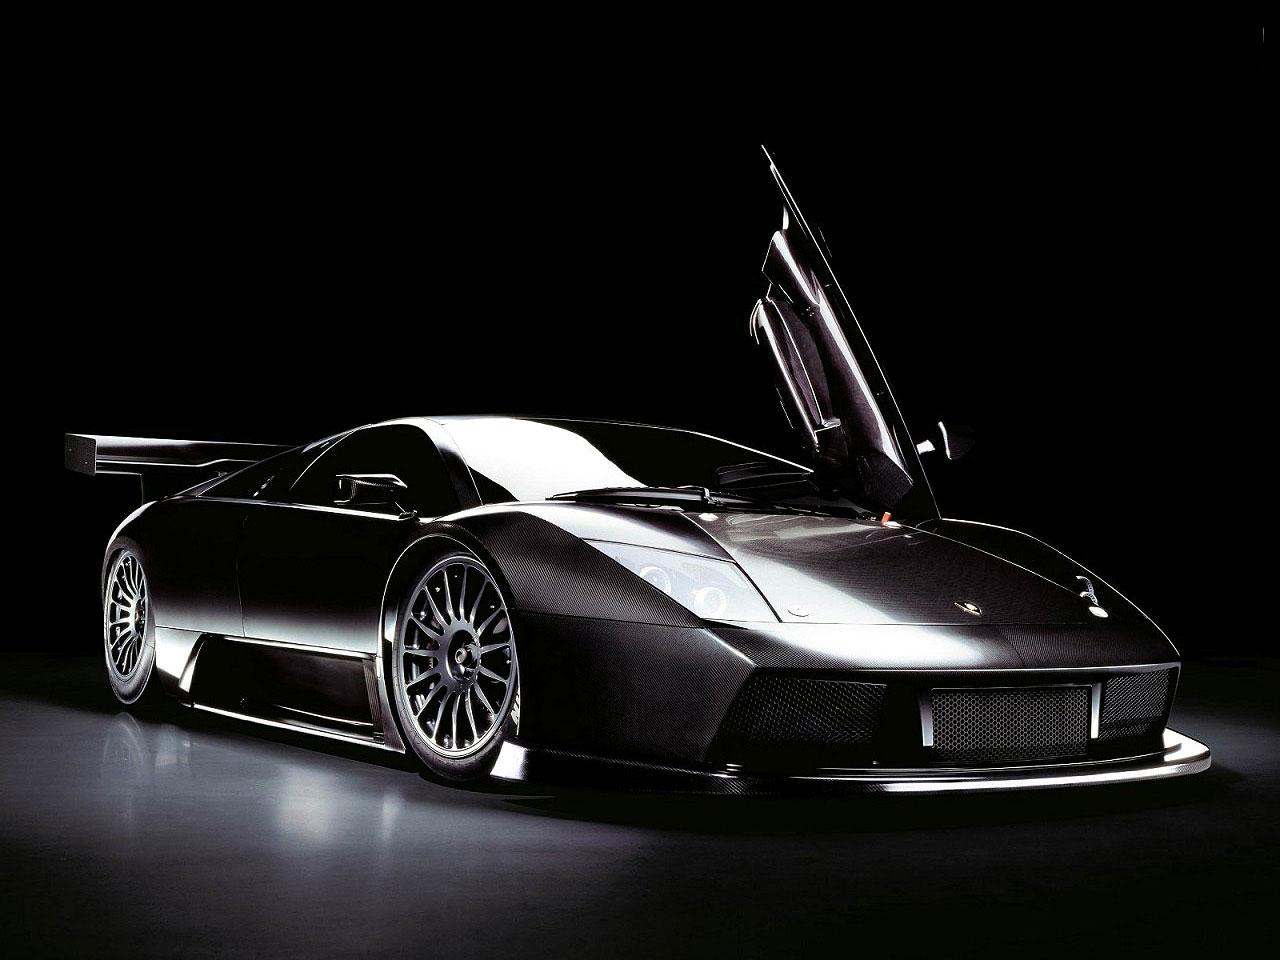 http://1.bp.blogspot.com/-fwoxmBwLMbs/TlybbdZi5XI/AAAAAAAACYE/1AnZPNRyzlw/s1600/Lamborghini-Wallpapers_2812201001.jpg